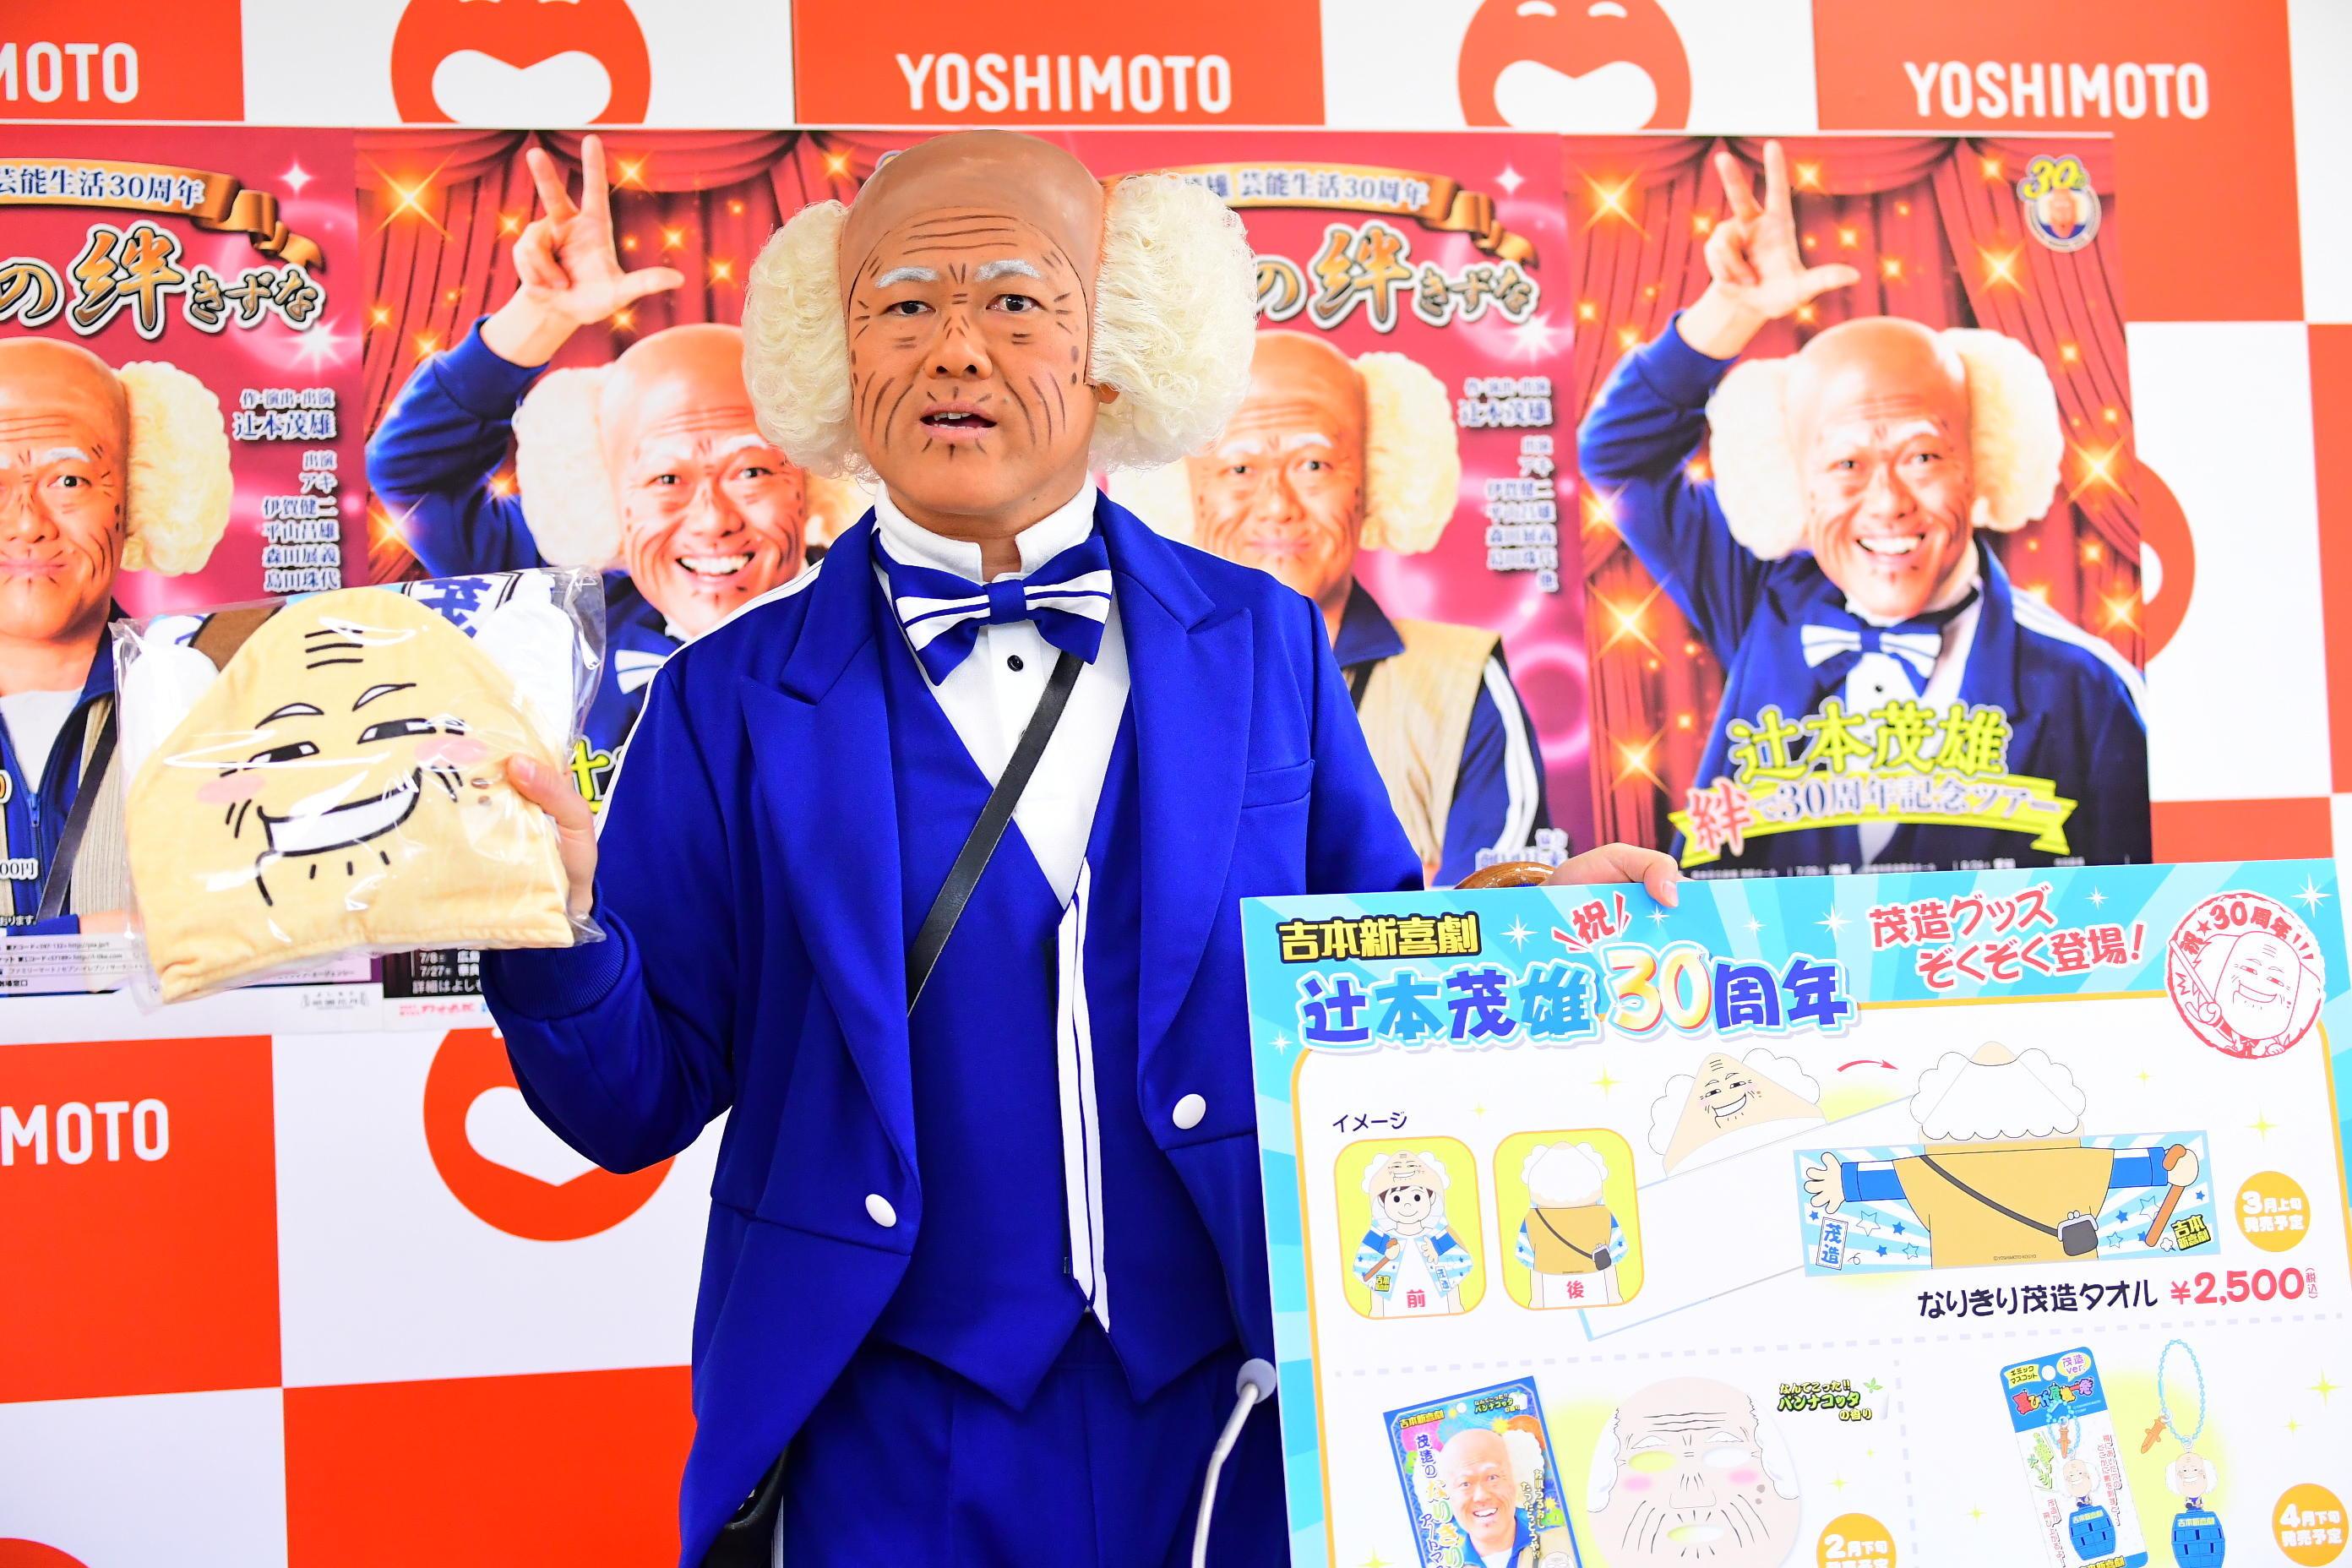 http://news.yoshimoto.co.jp/20170131181835-8b66446fa7acf0eff40a7934070b77099a169a93.jpg